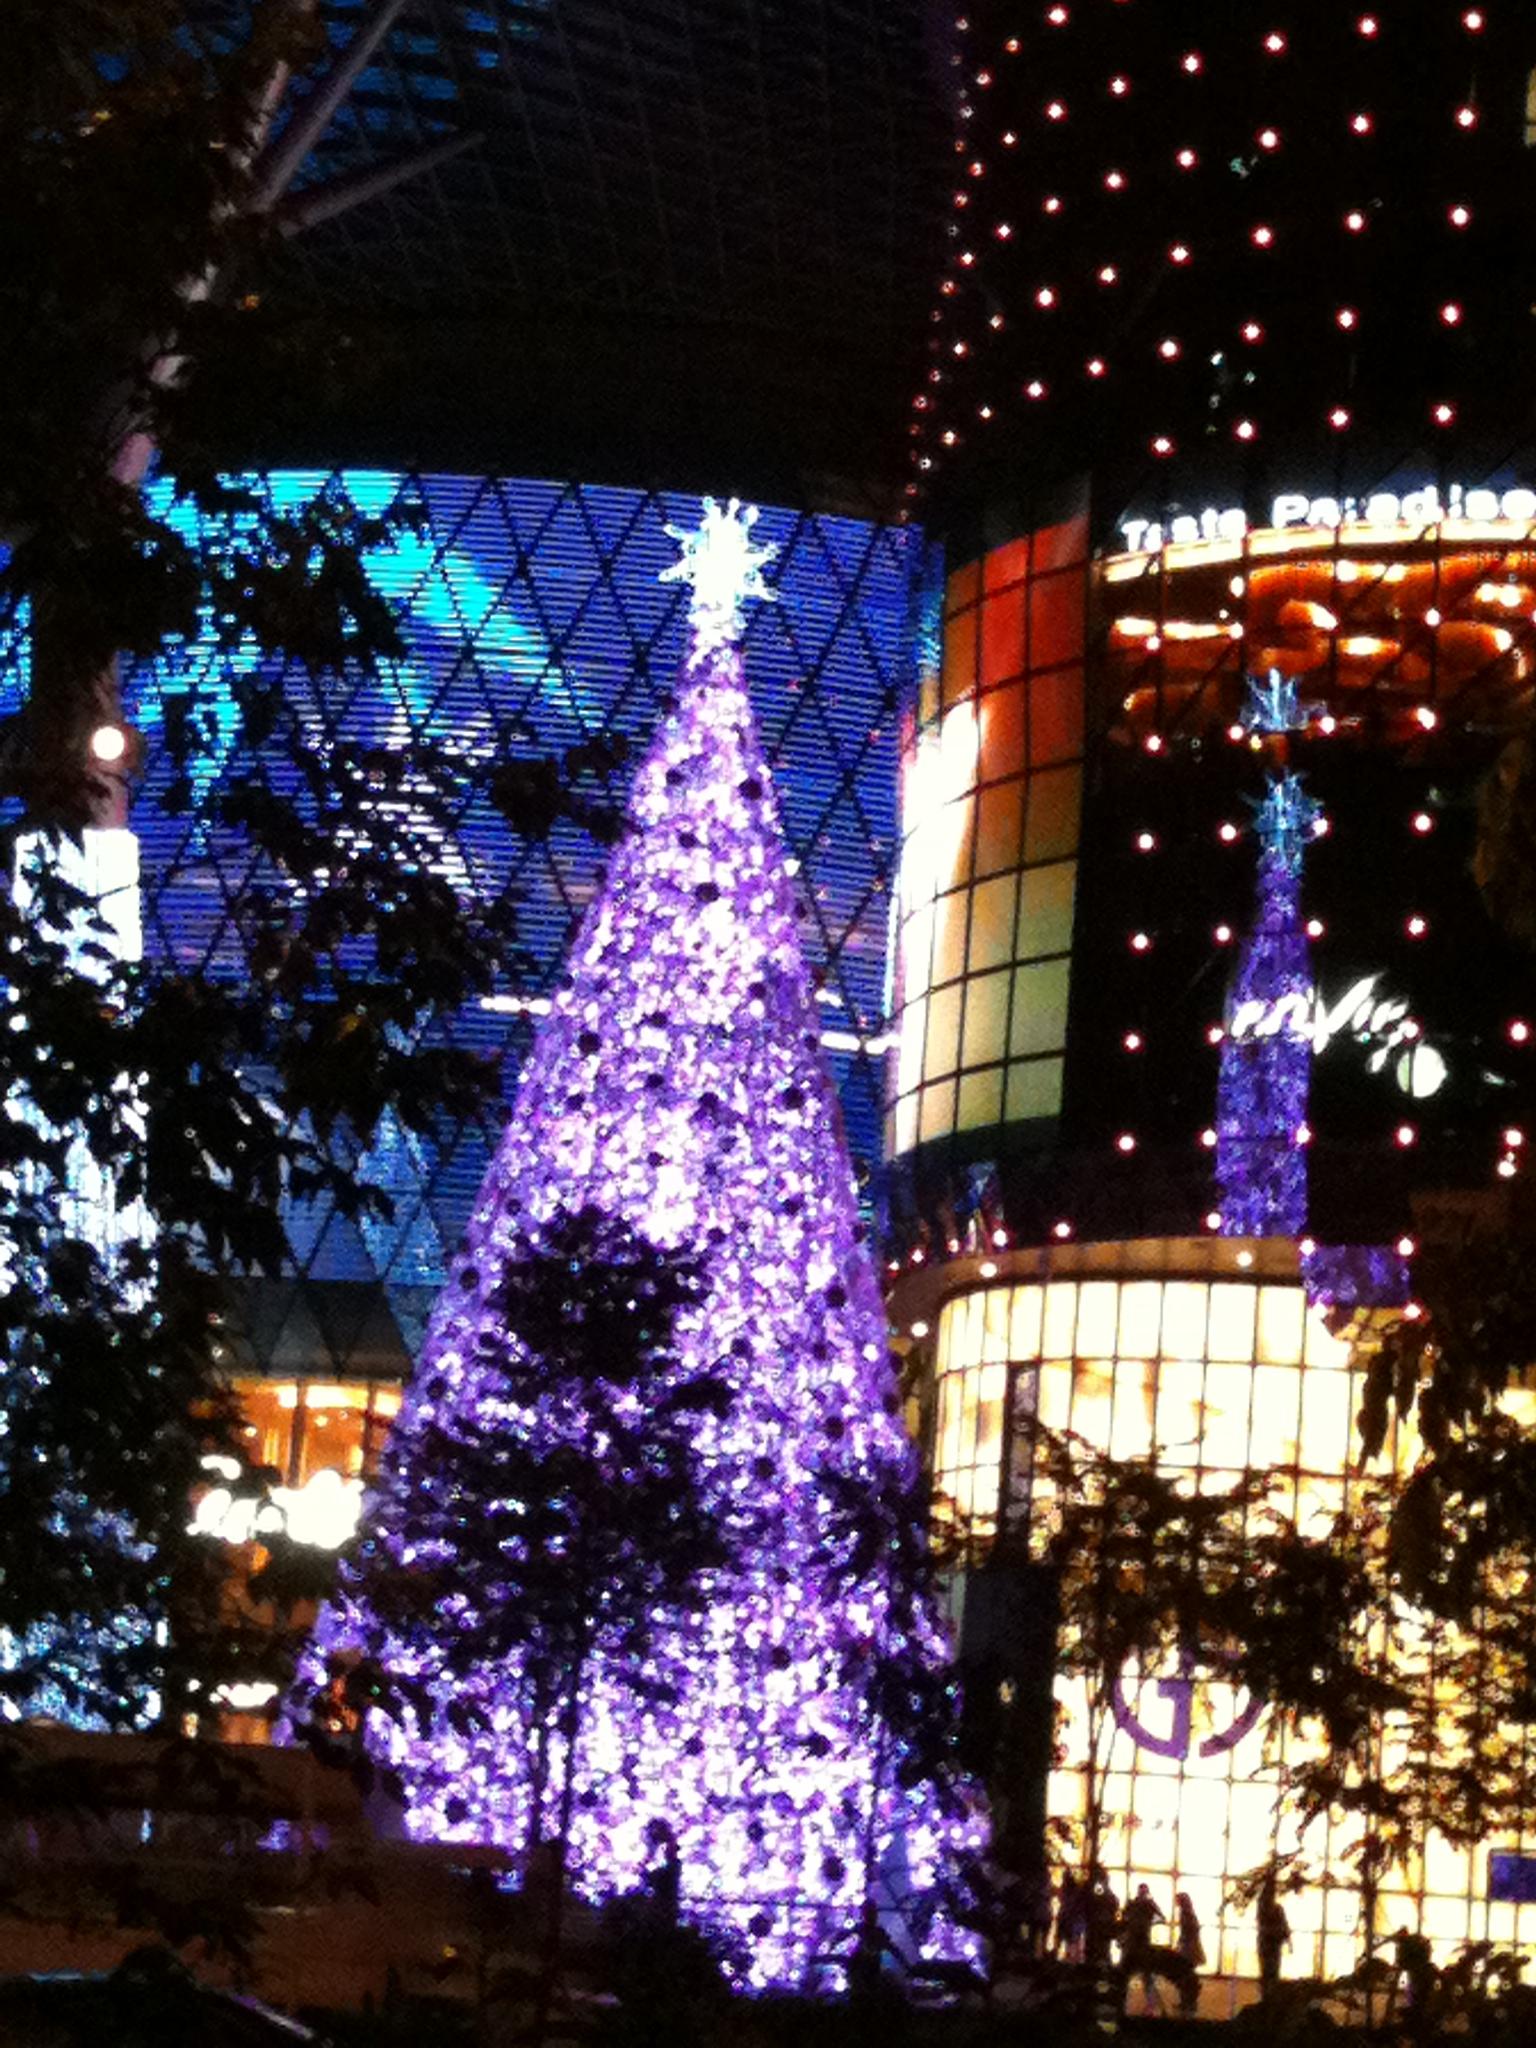 Christmas Has Come Early. | The Shooting Star